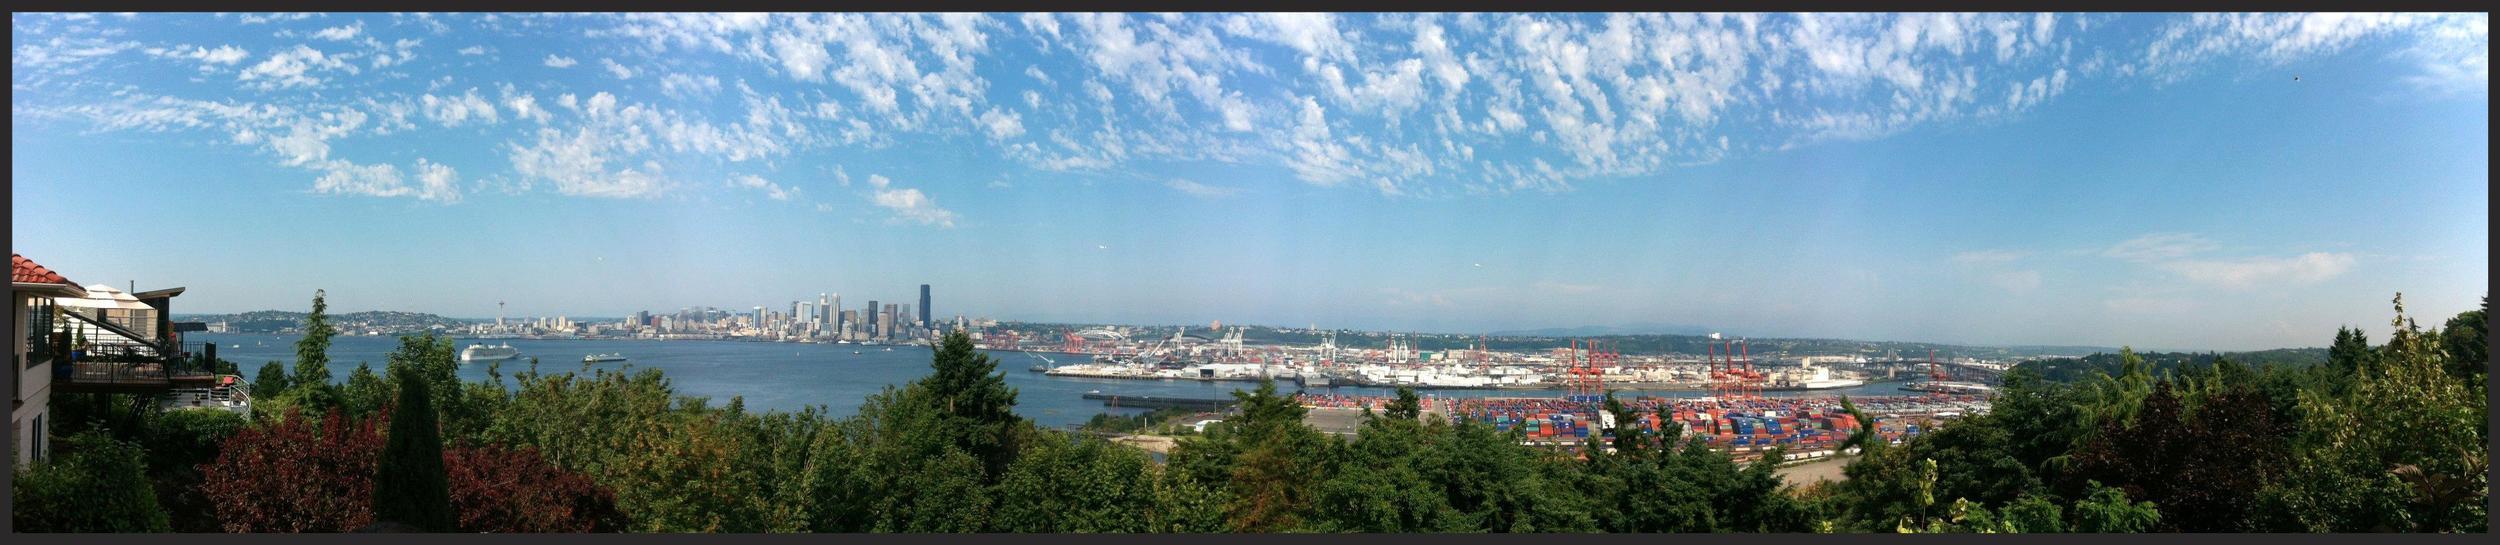 2012 - Age 30 Seattle Skyline against Puget Sound